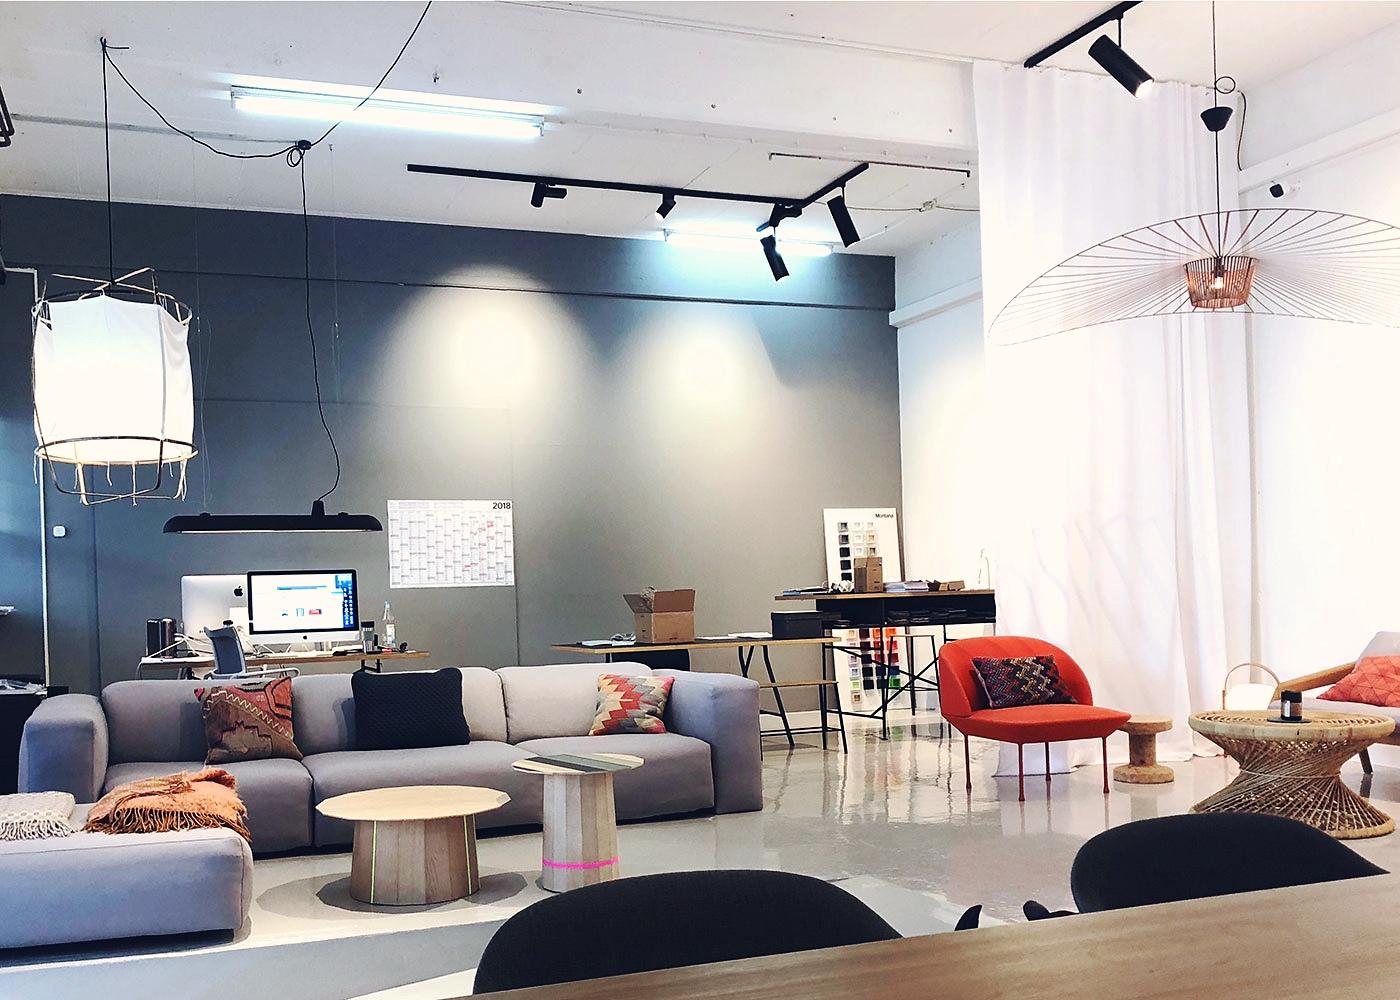 Studio Bougiandbo